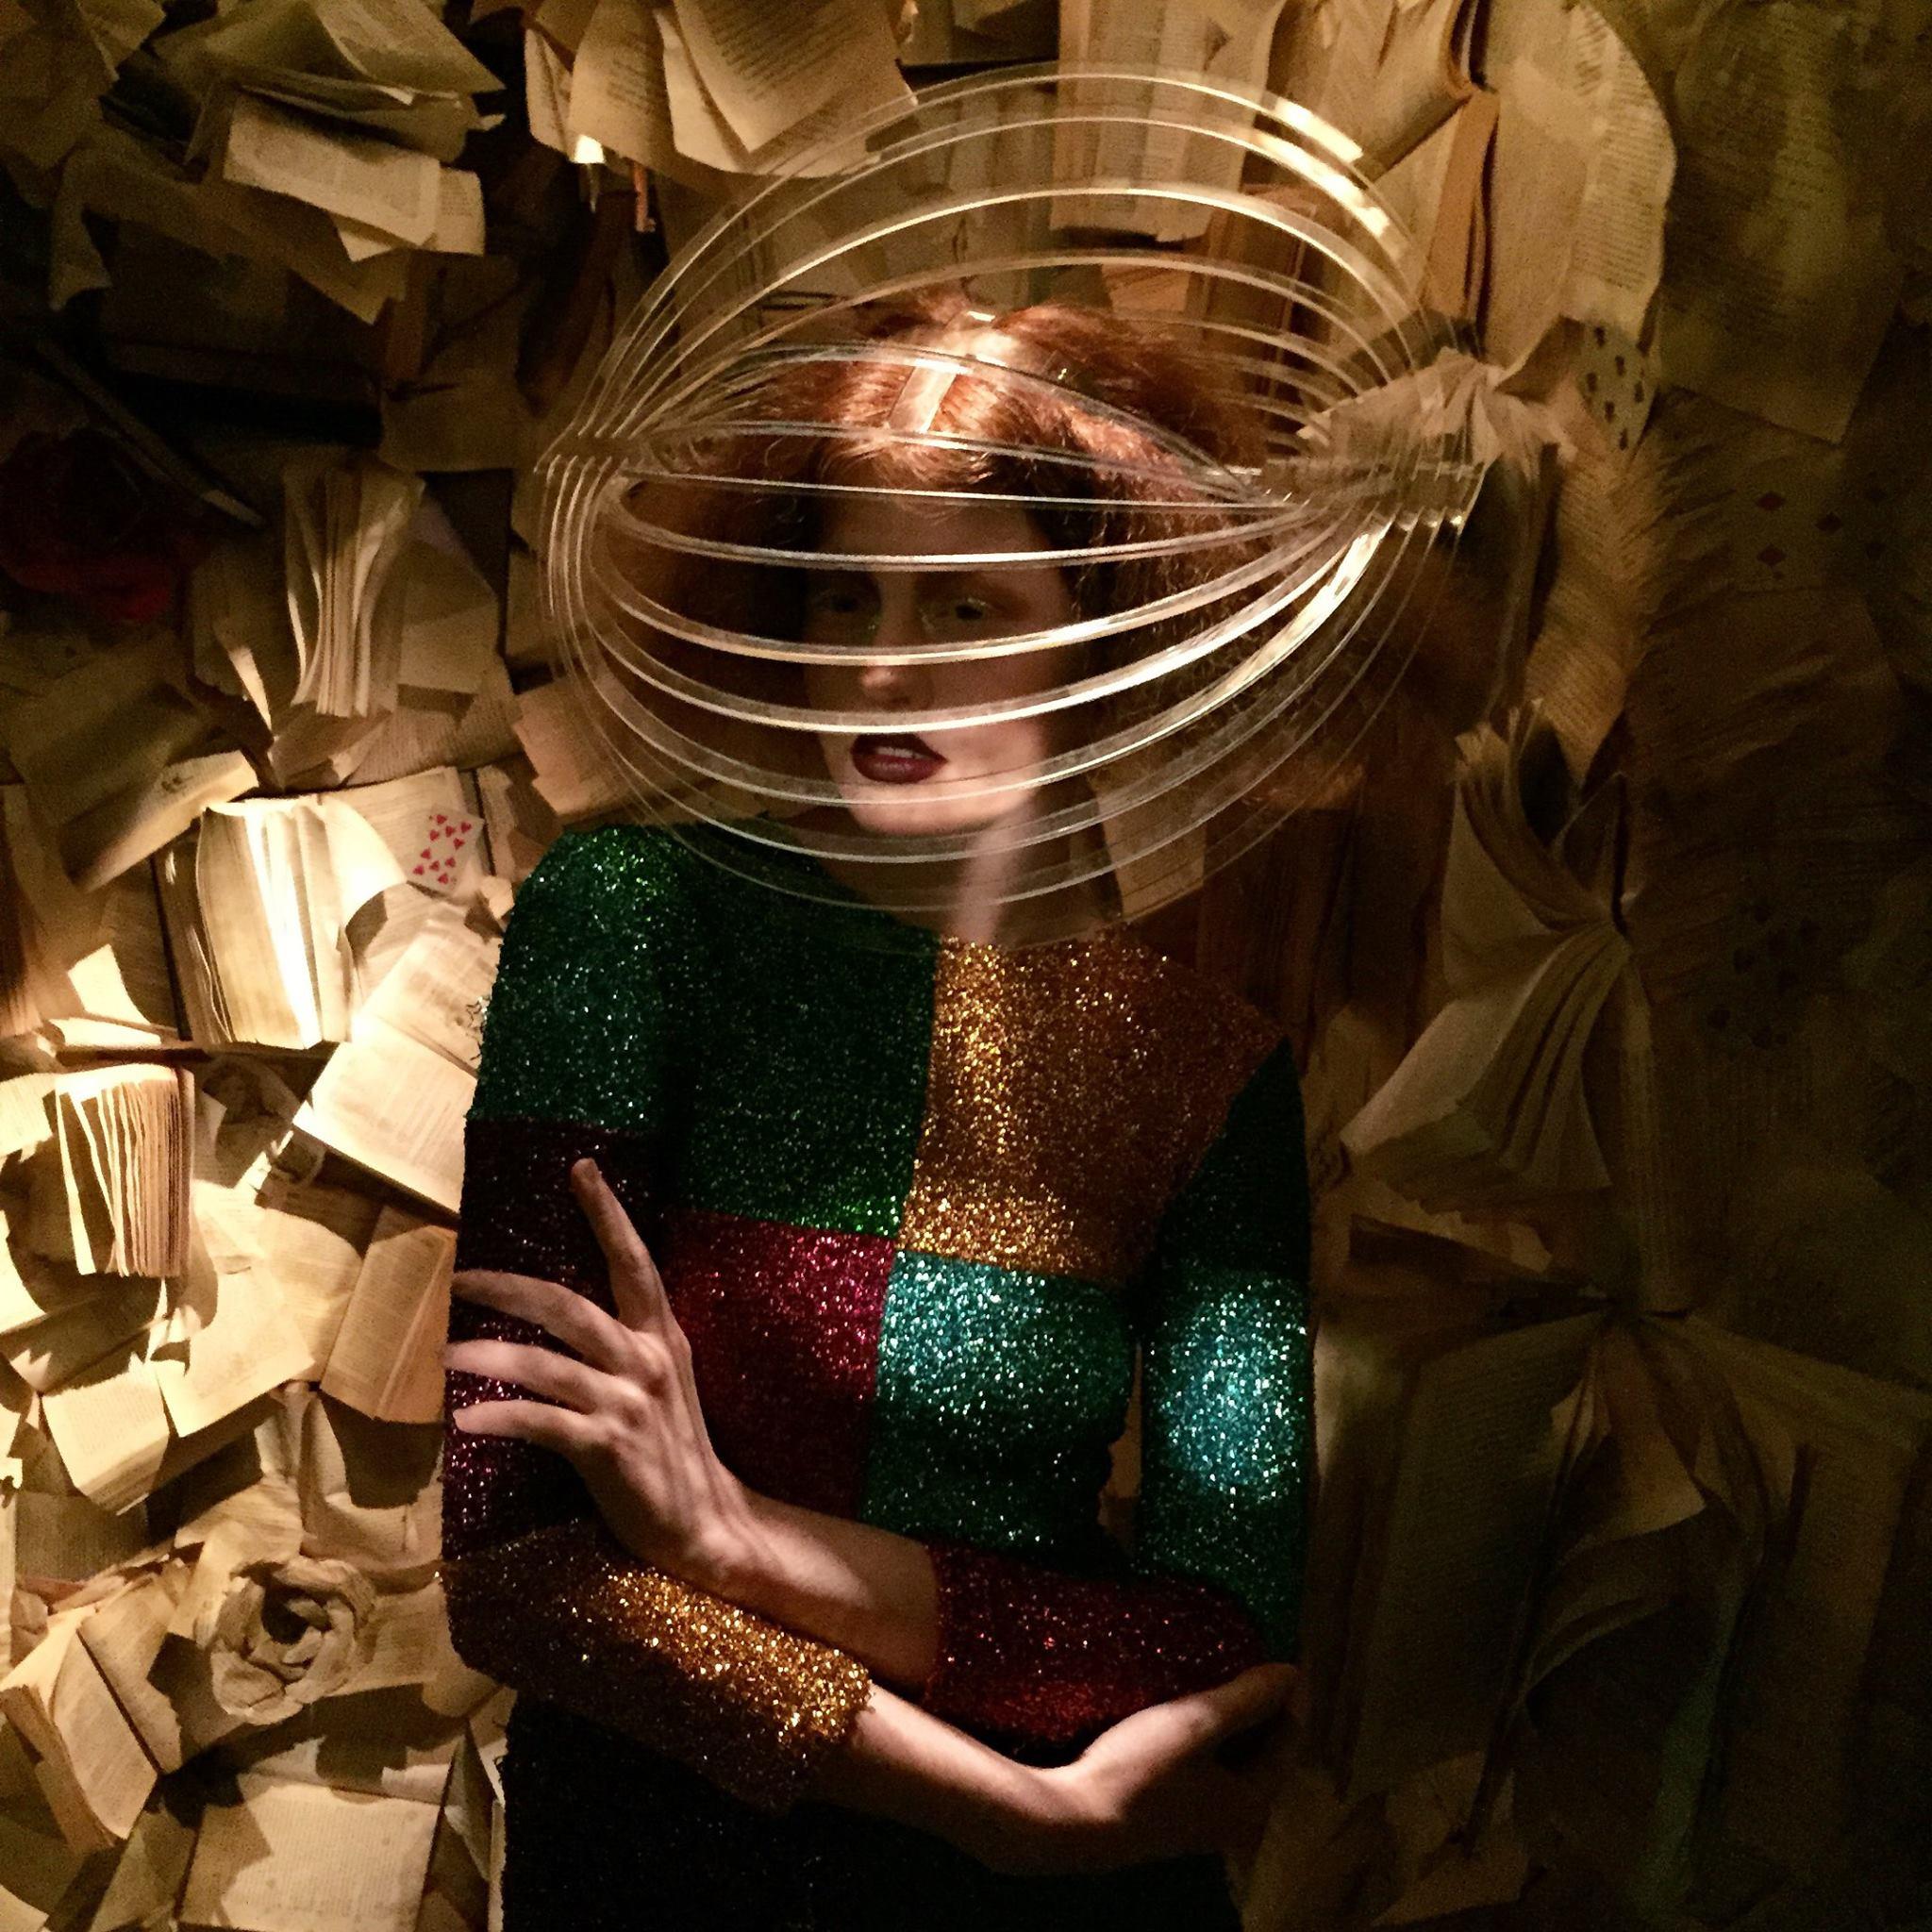 Perspex Headpiece - Wonderland Sessions - Alice Adventures Underground